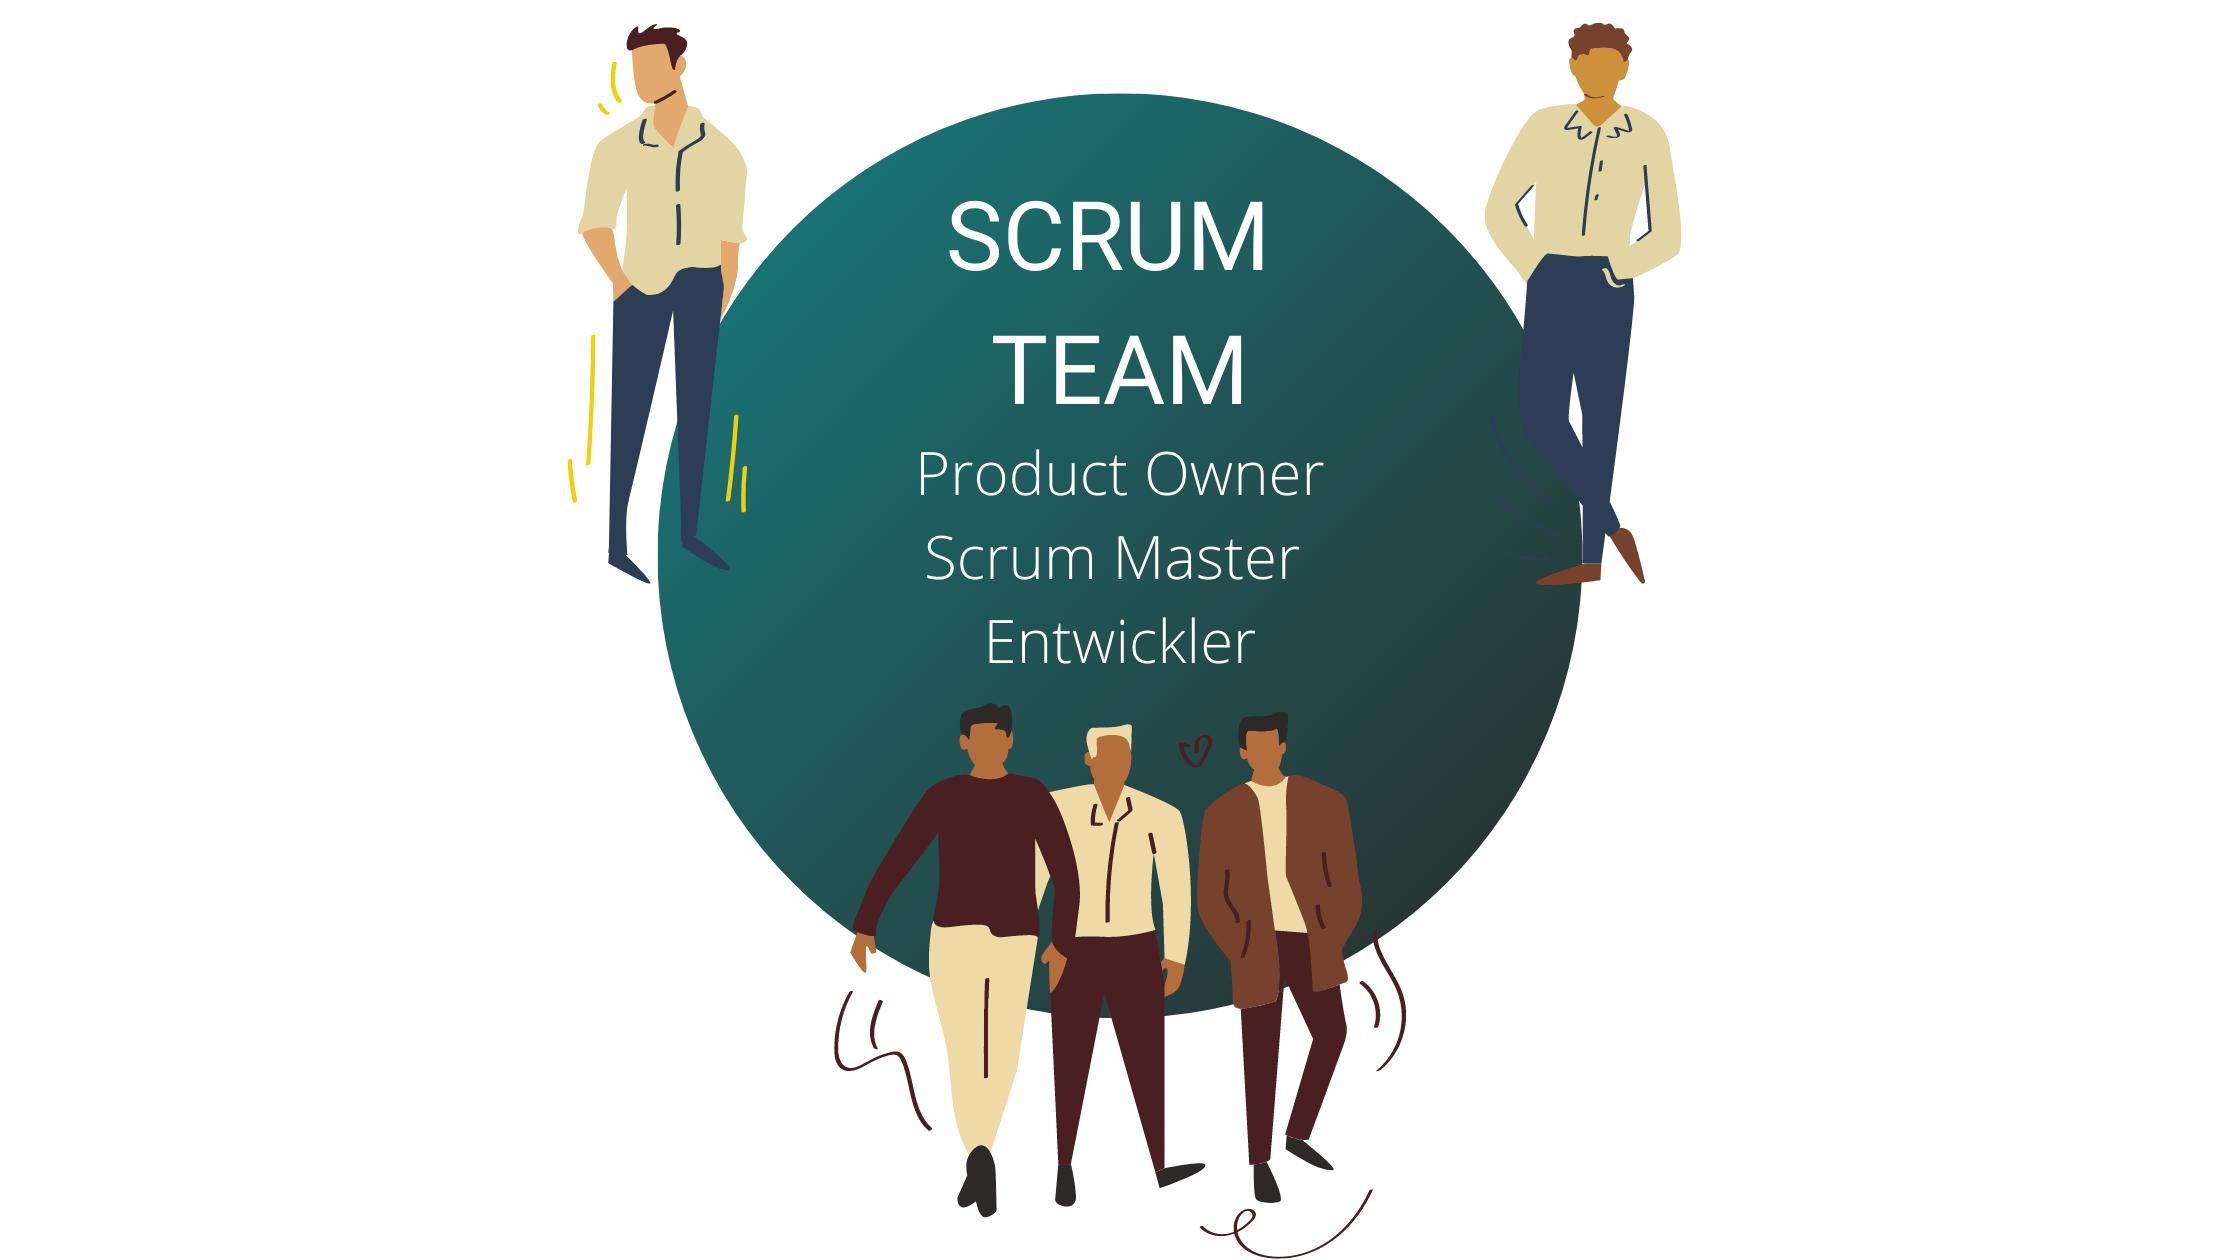 Scrum Team Scrum Guide 2020 Product Owner Scrum Master Entwickler